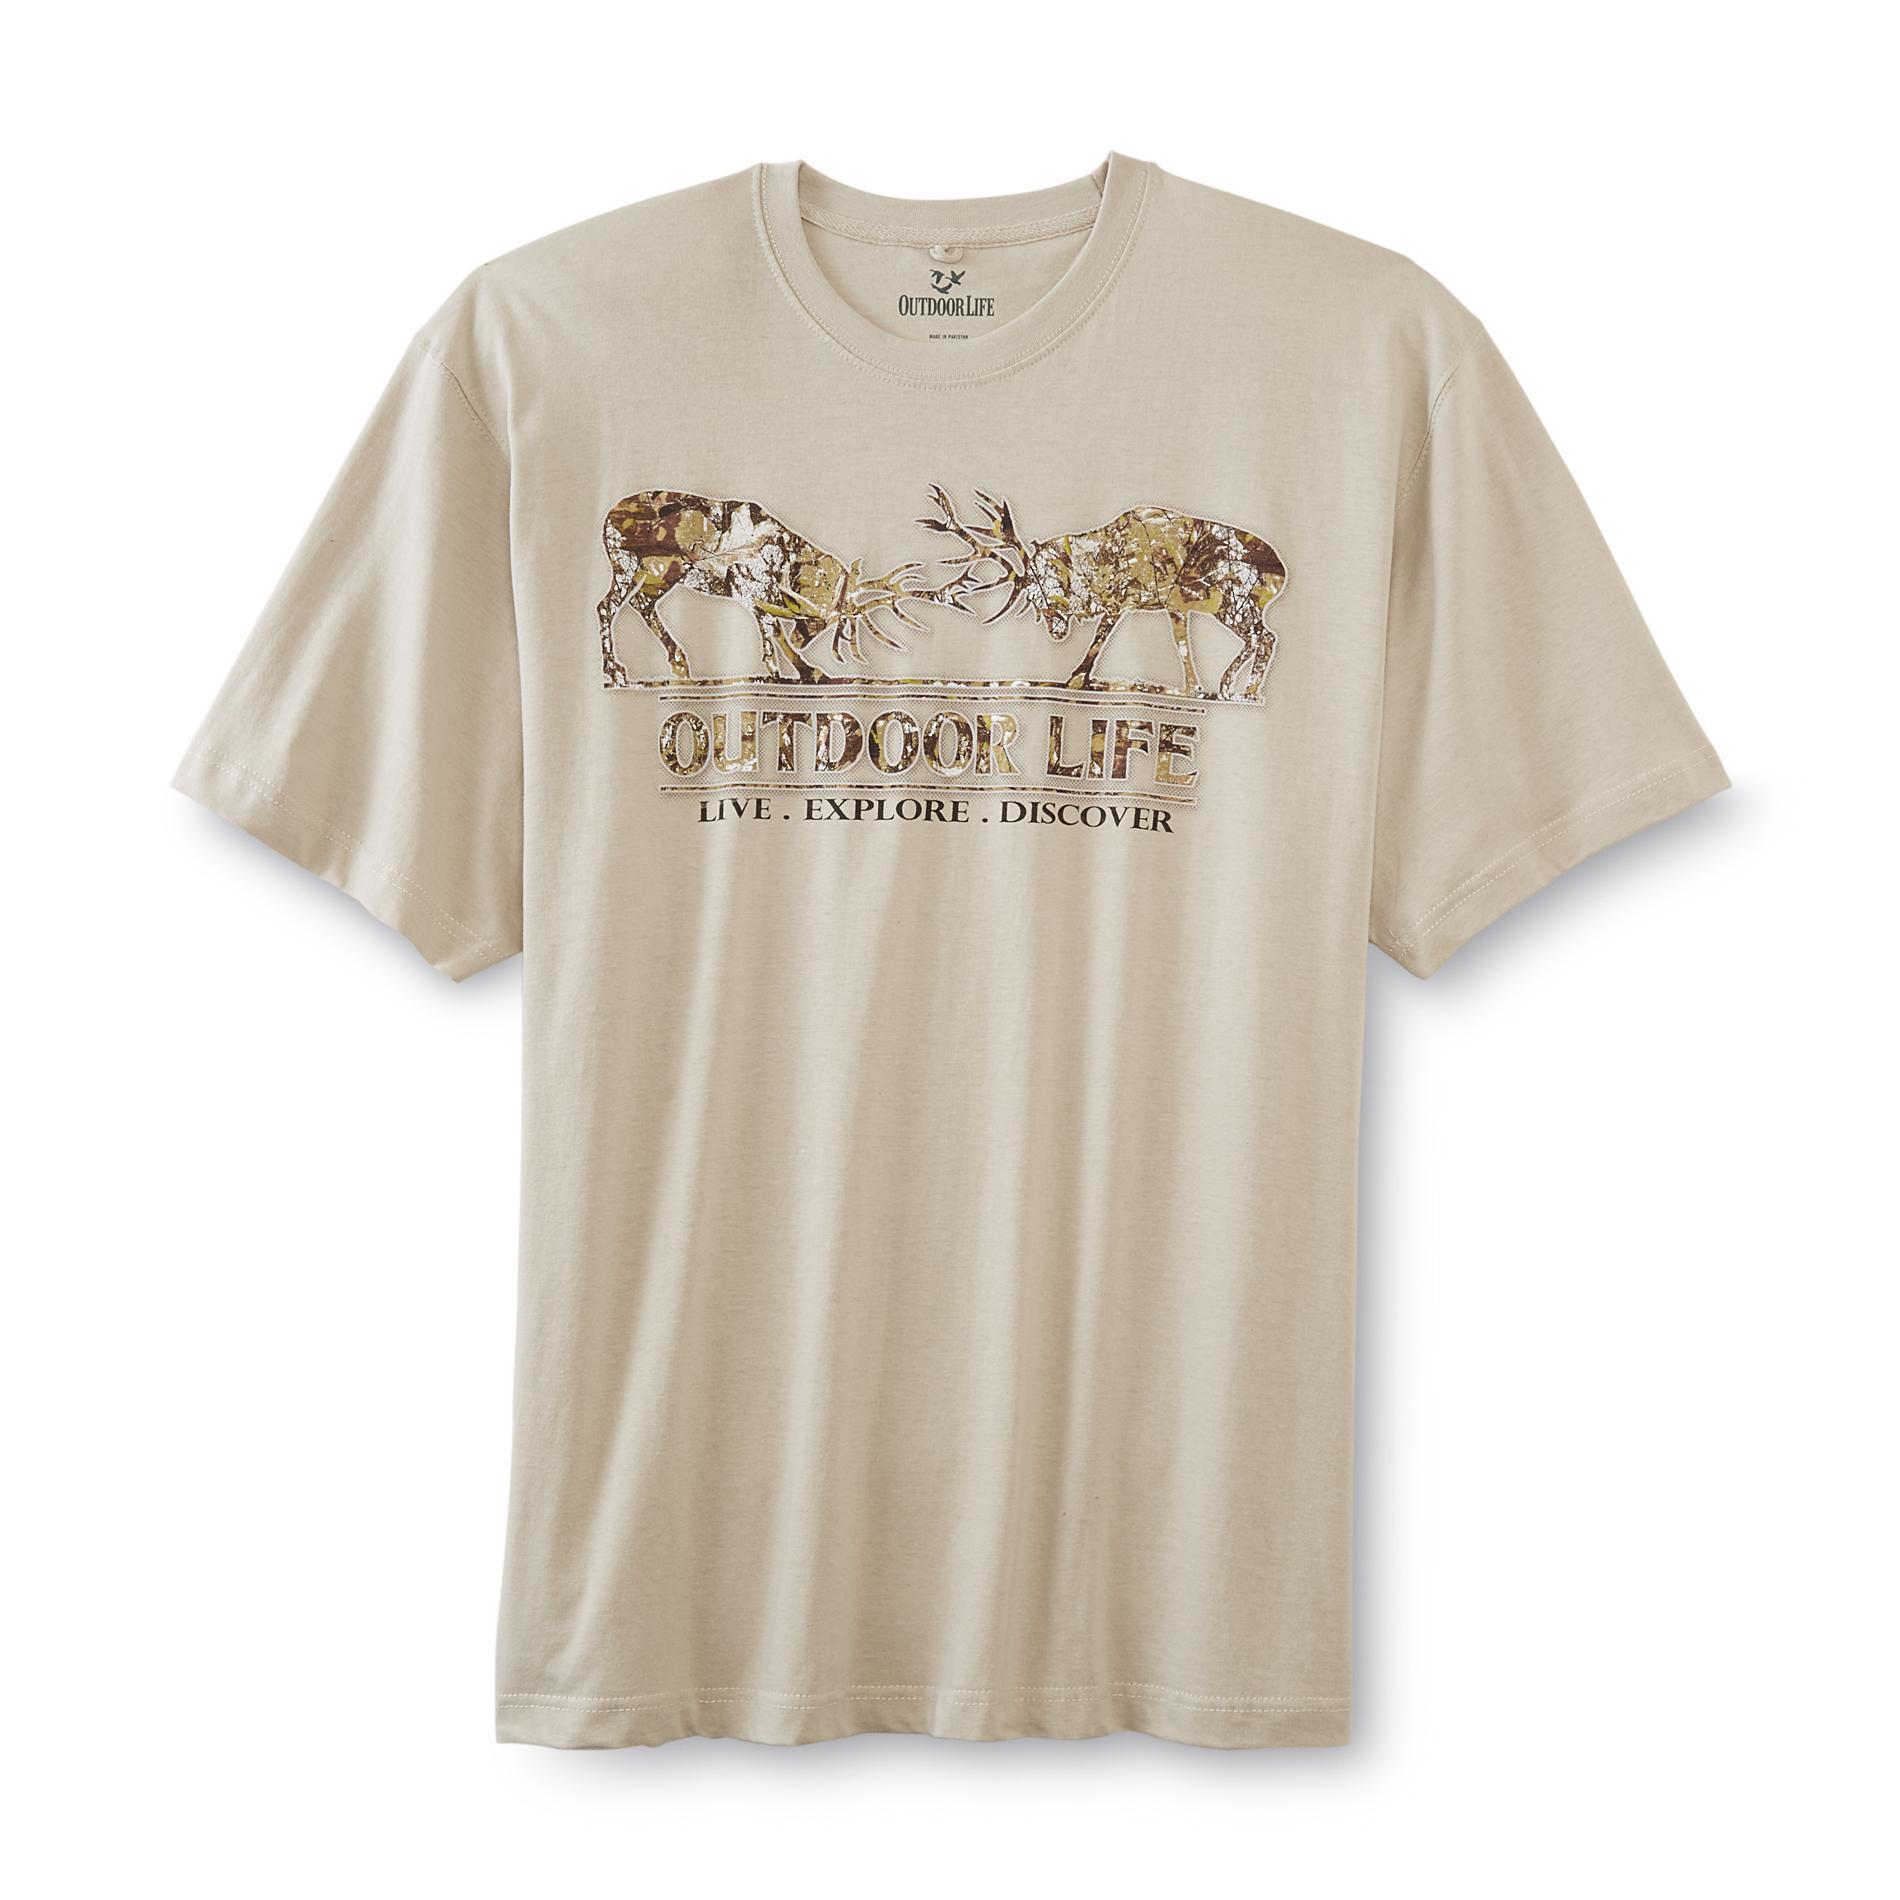 Outdoor Life Men's Big & Tall Graphic T-Shirt - Camo Deer